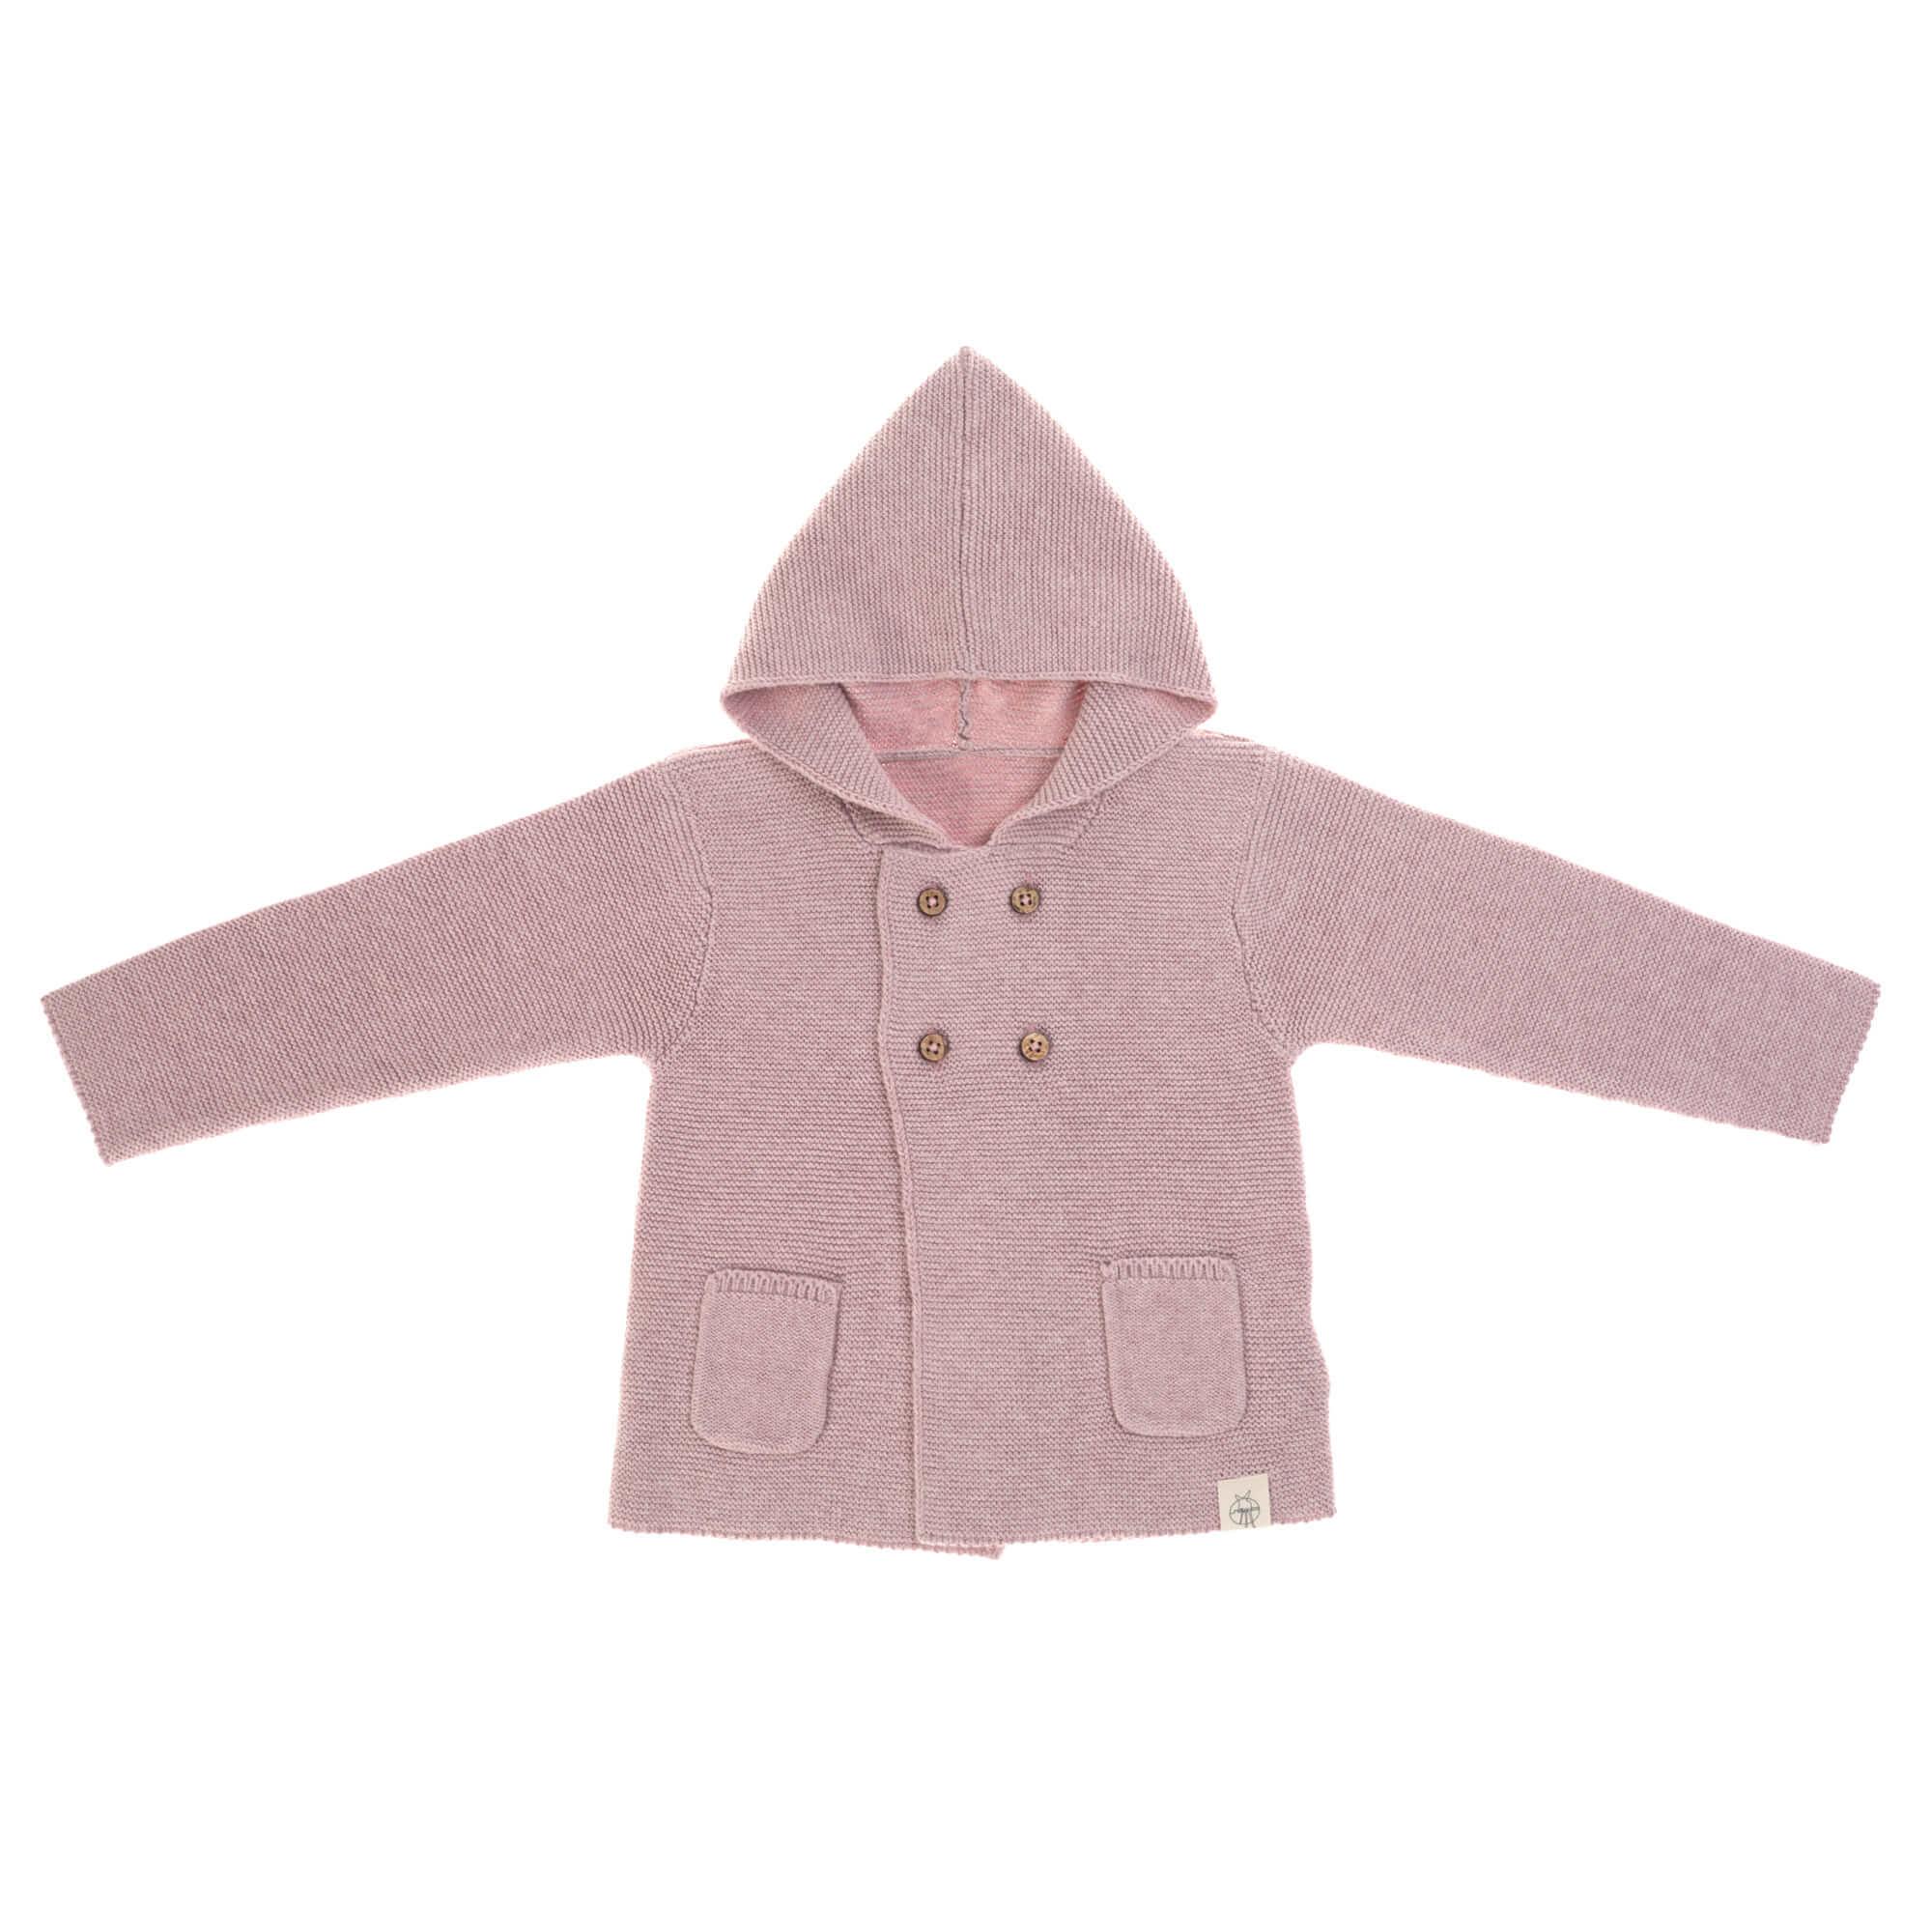 Baby Jacke - Garden Explorer Light Pink - Lässig